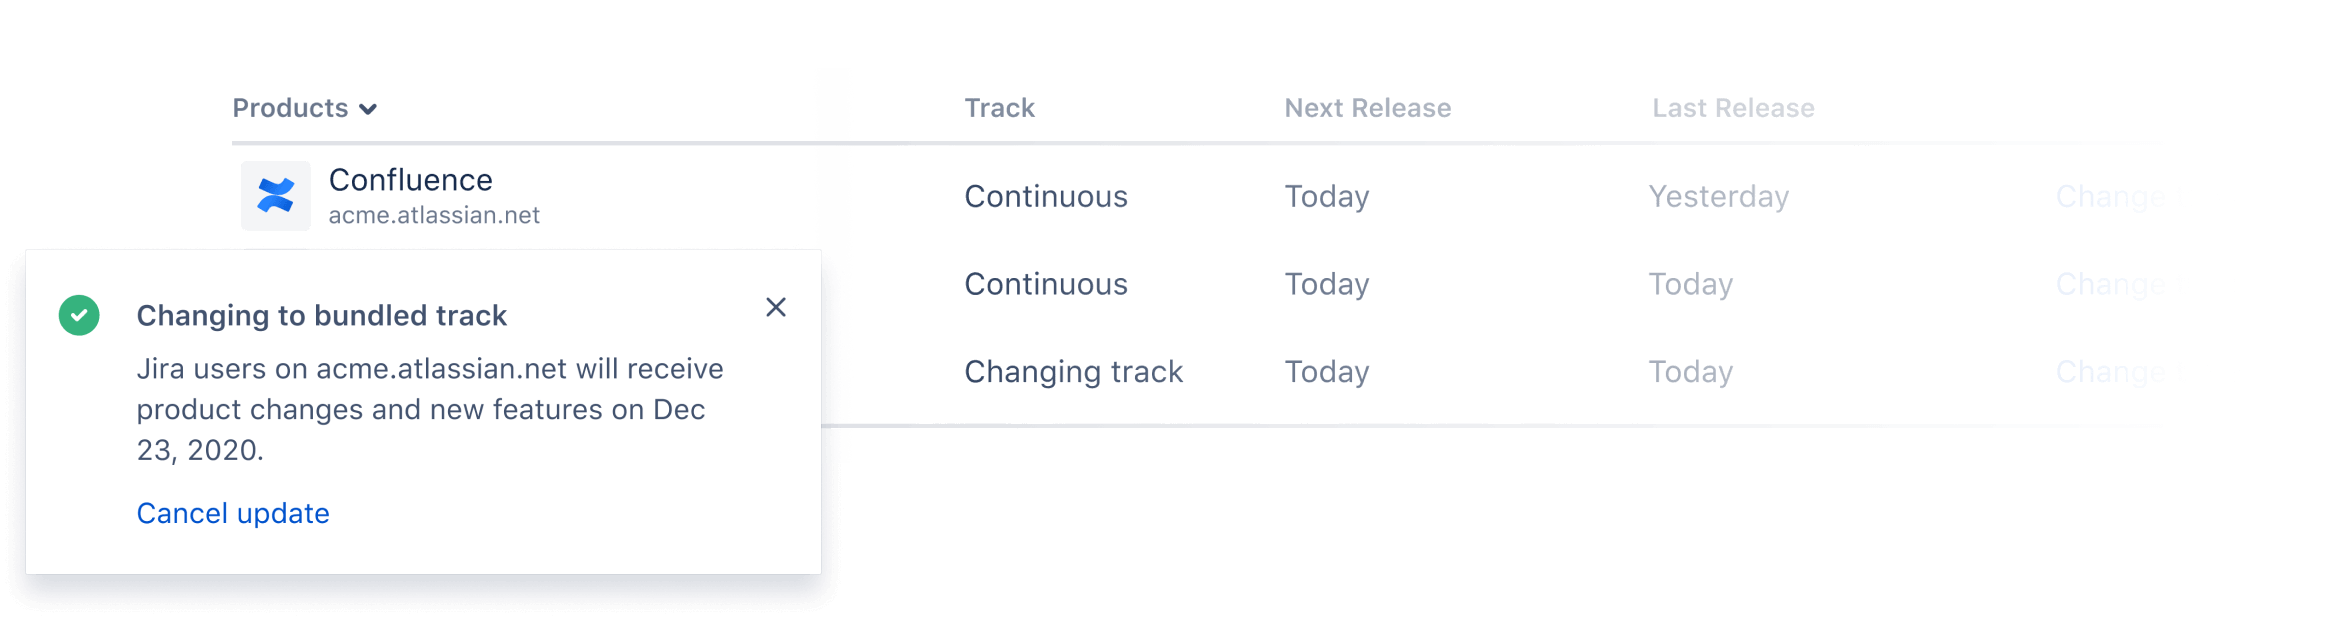 Bundled track screenshot